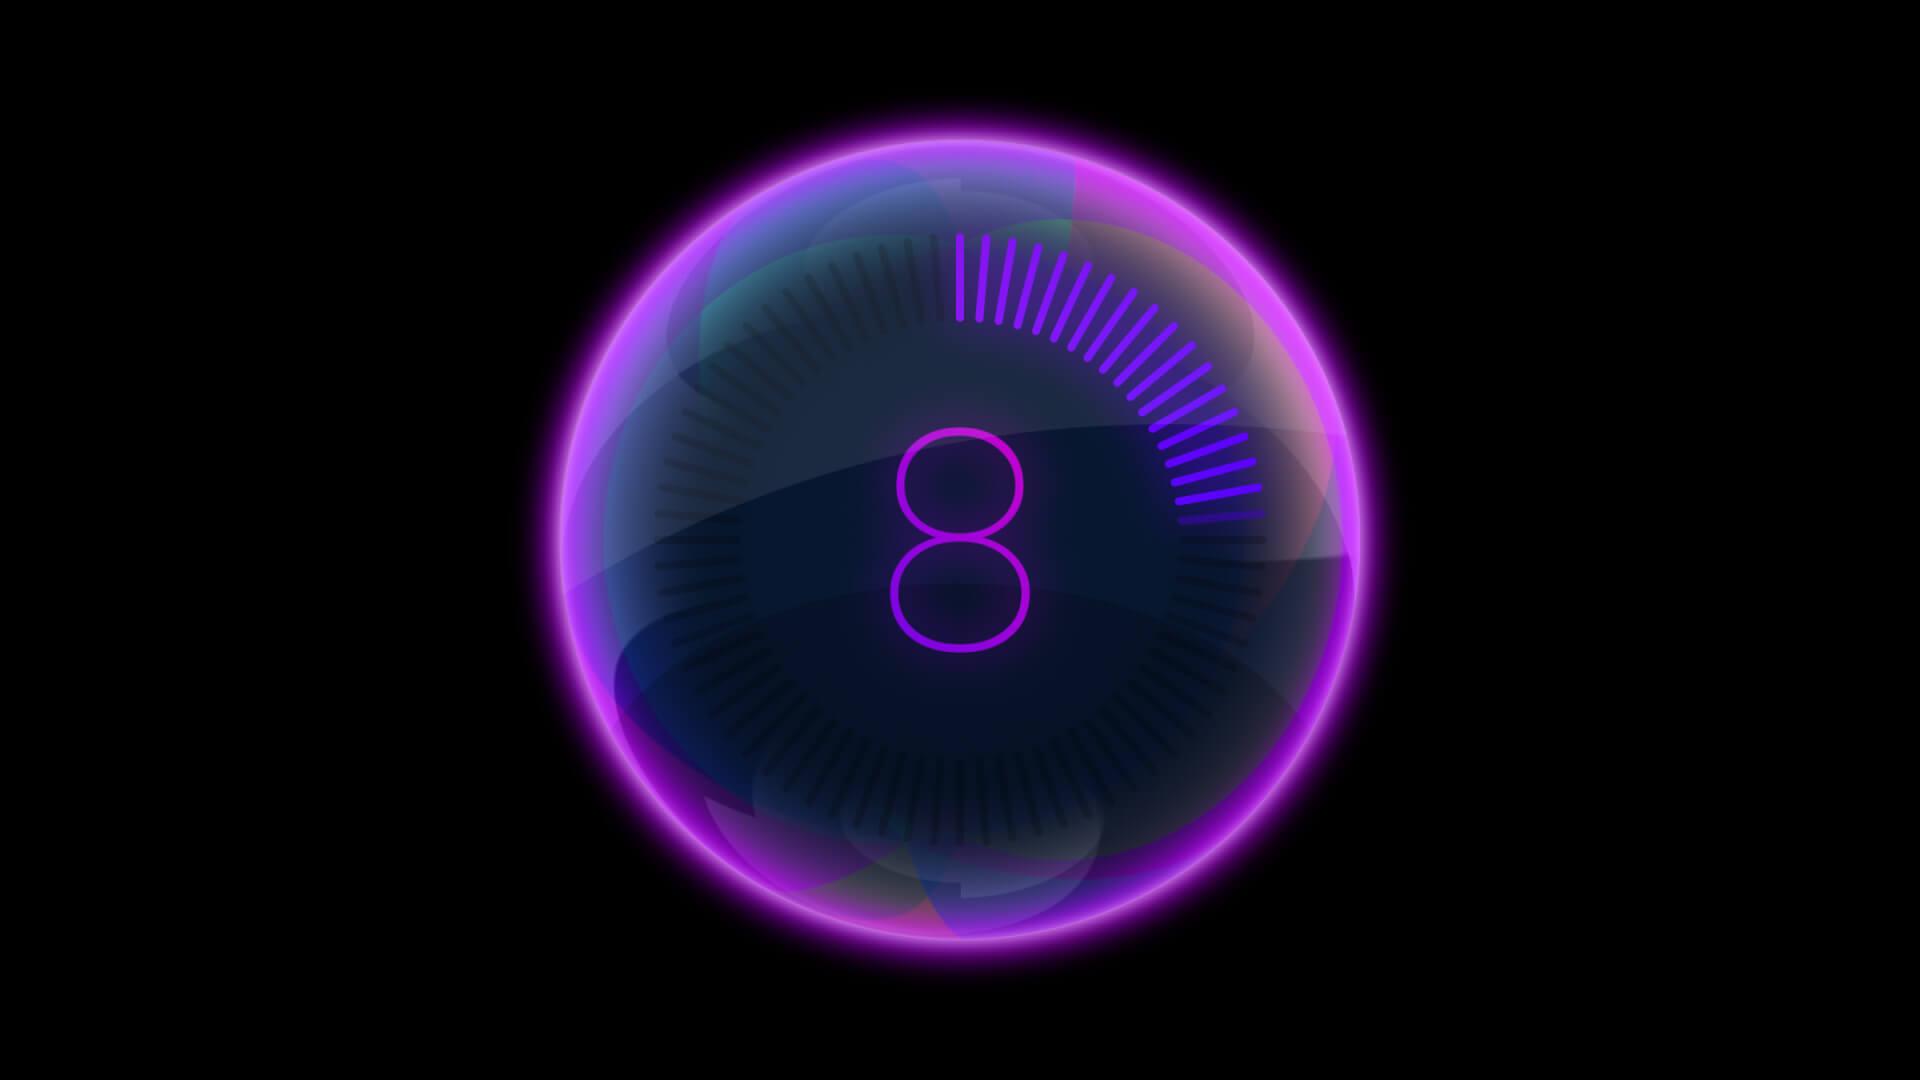 Glass Ball 10 Second Countdown Overlay Premier Pro MOGRT Template